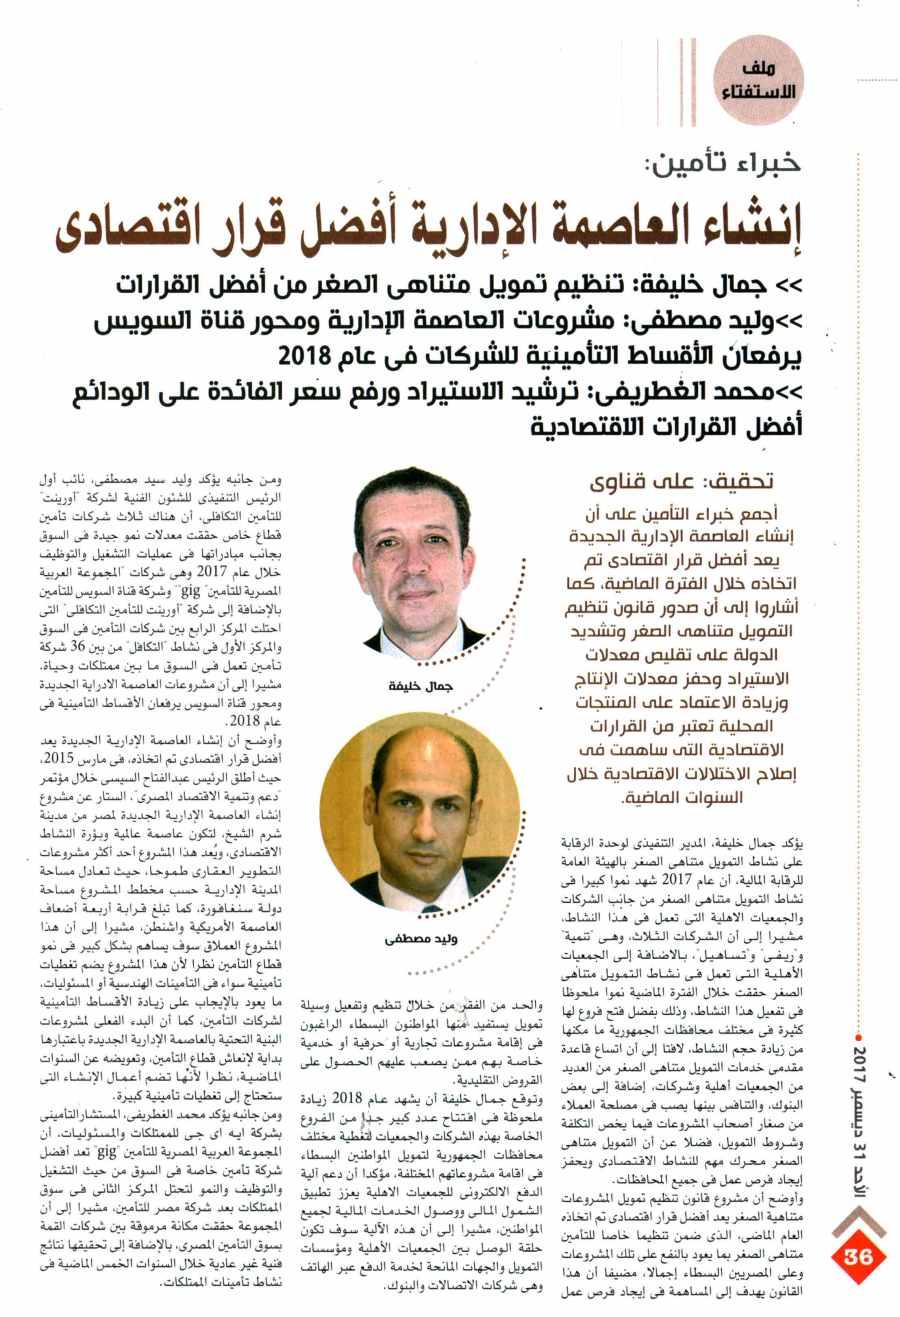 Al Ahram Al Iktisadi 31 Dec P.36.jpg